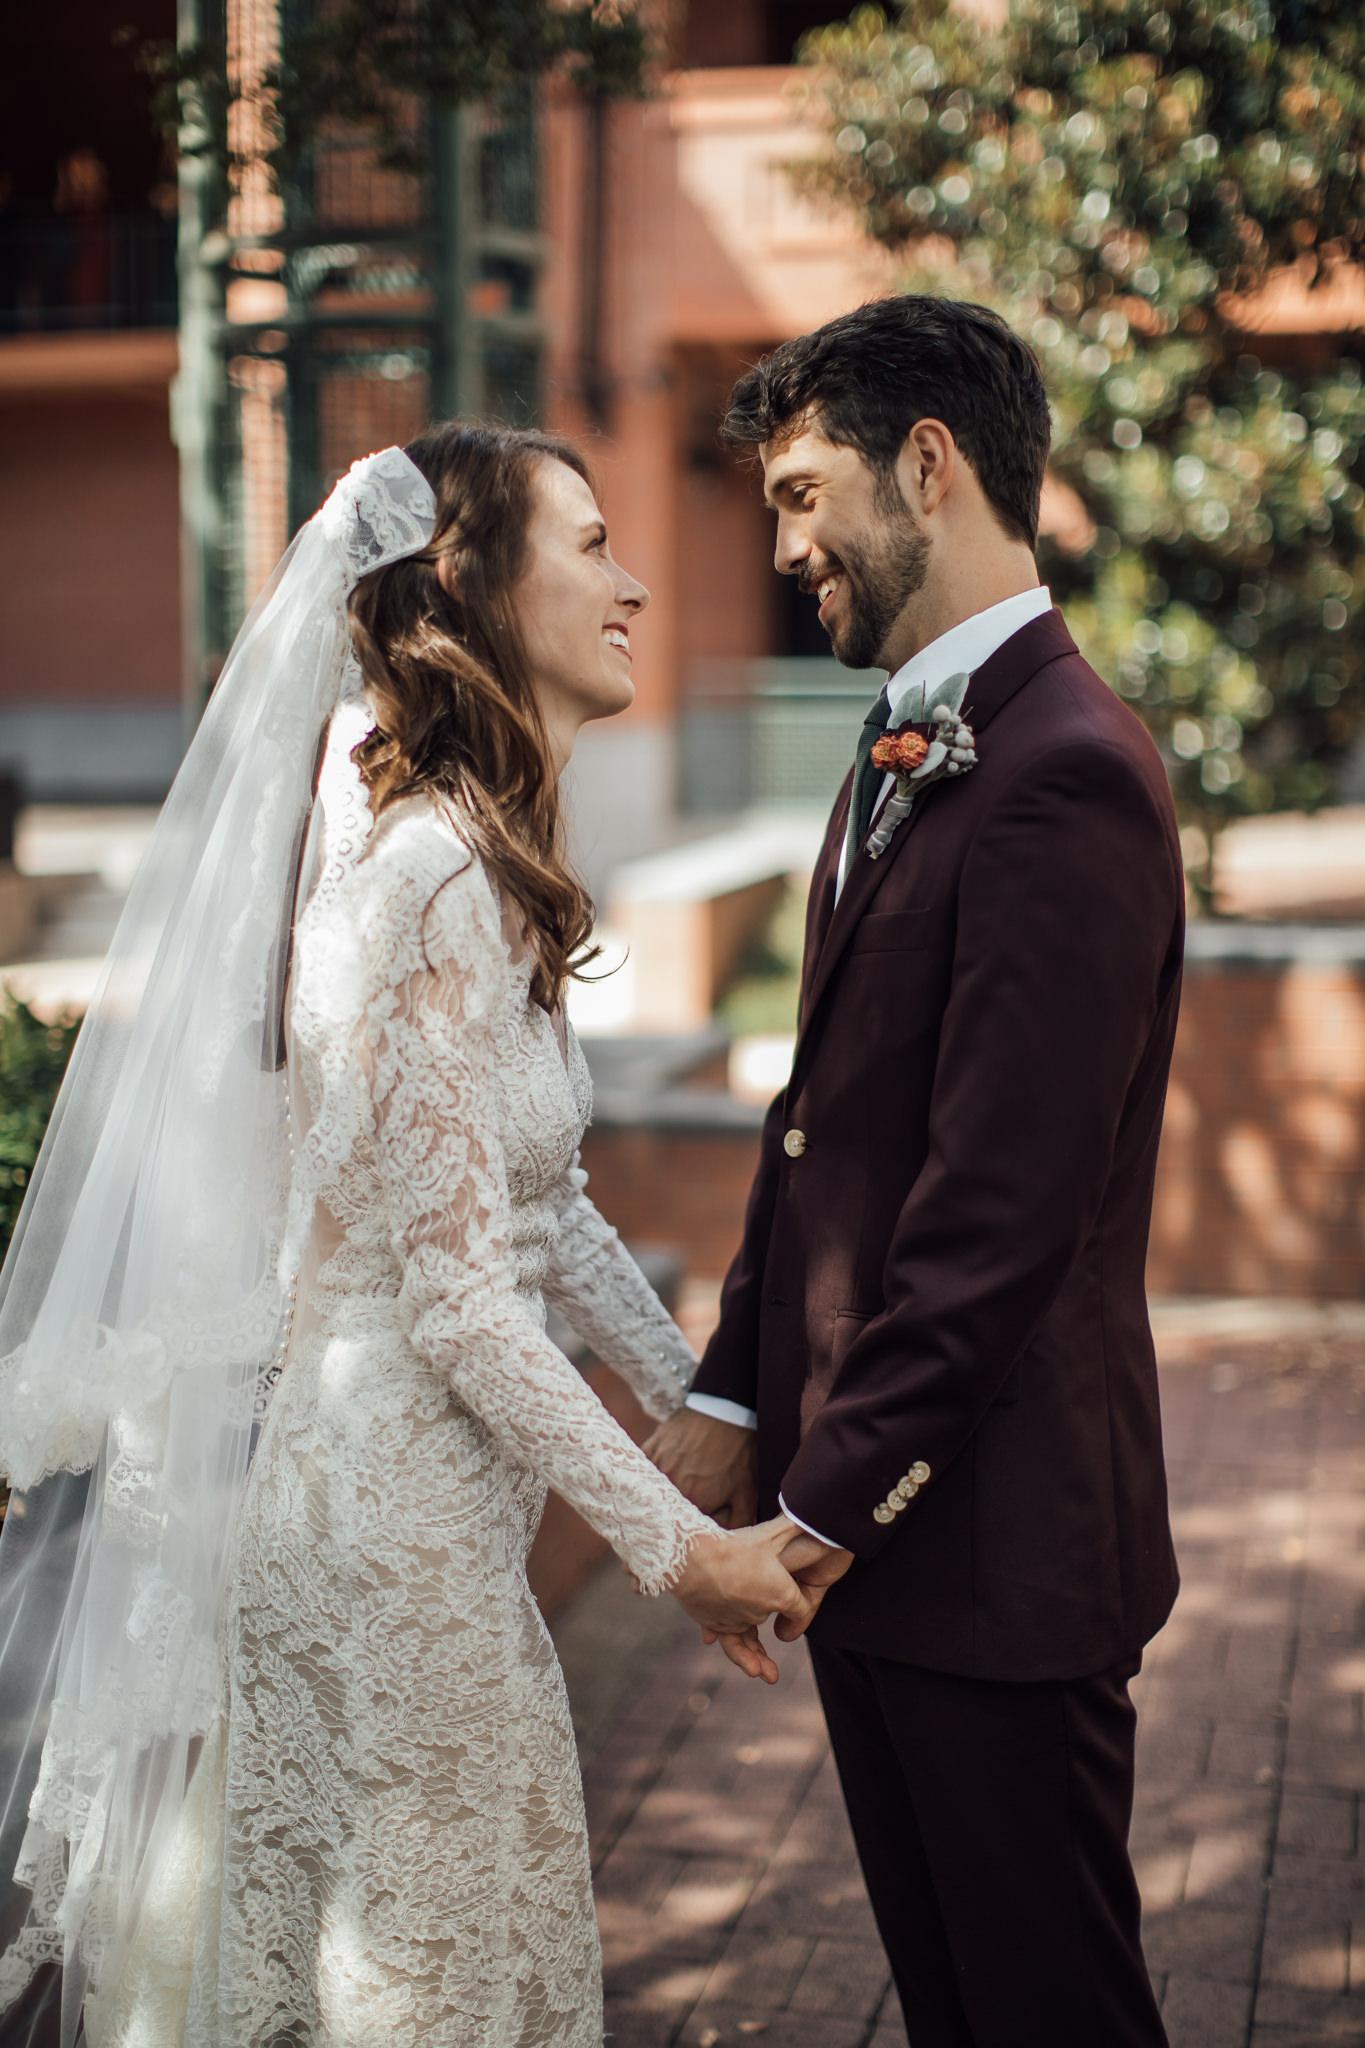 cassie-cook-photography-chattanooga-wedding-photographer-waterhouse-pavillon-adventurous-wedding